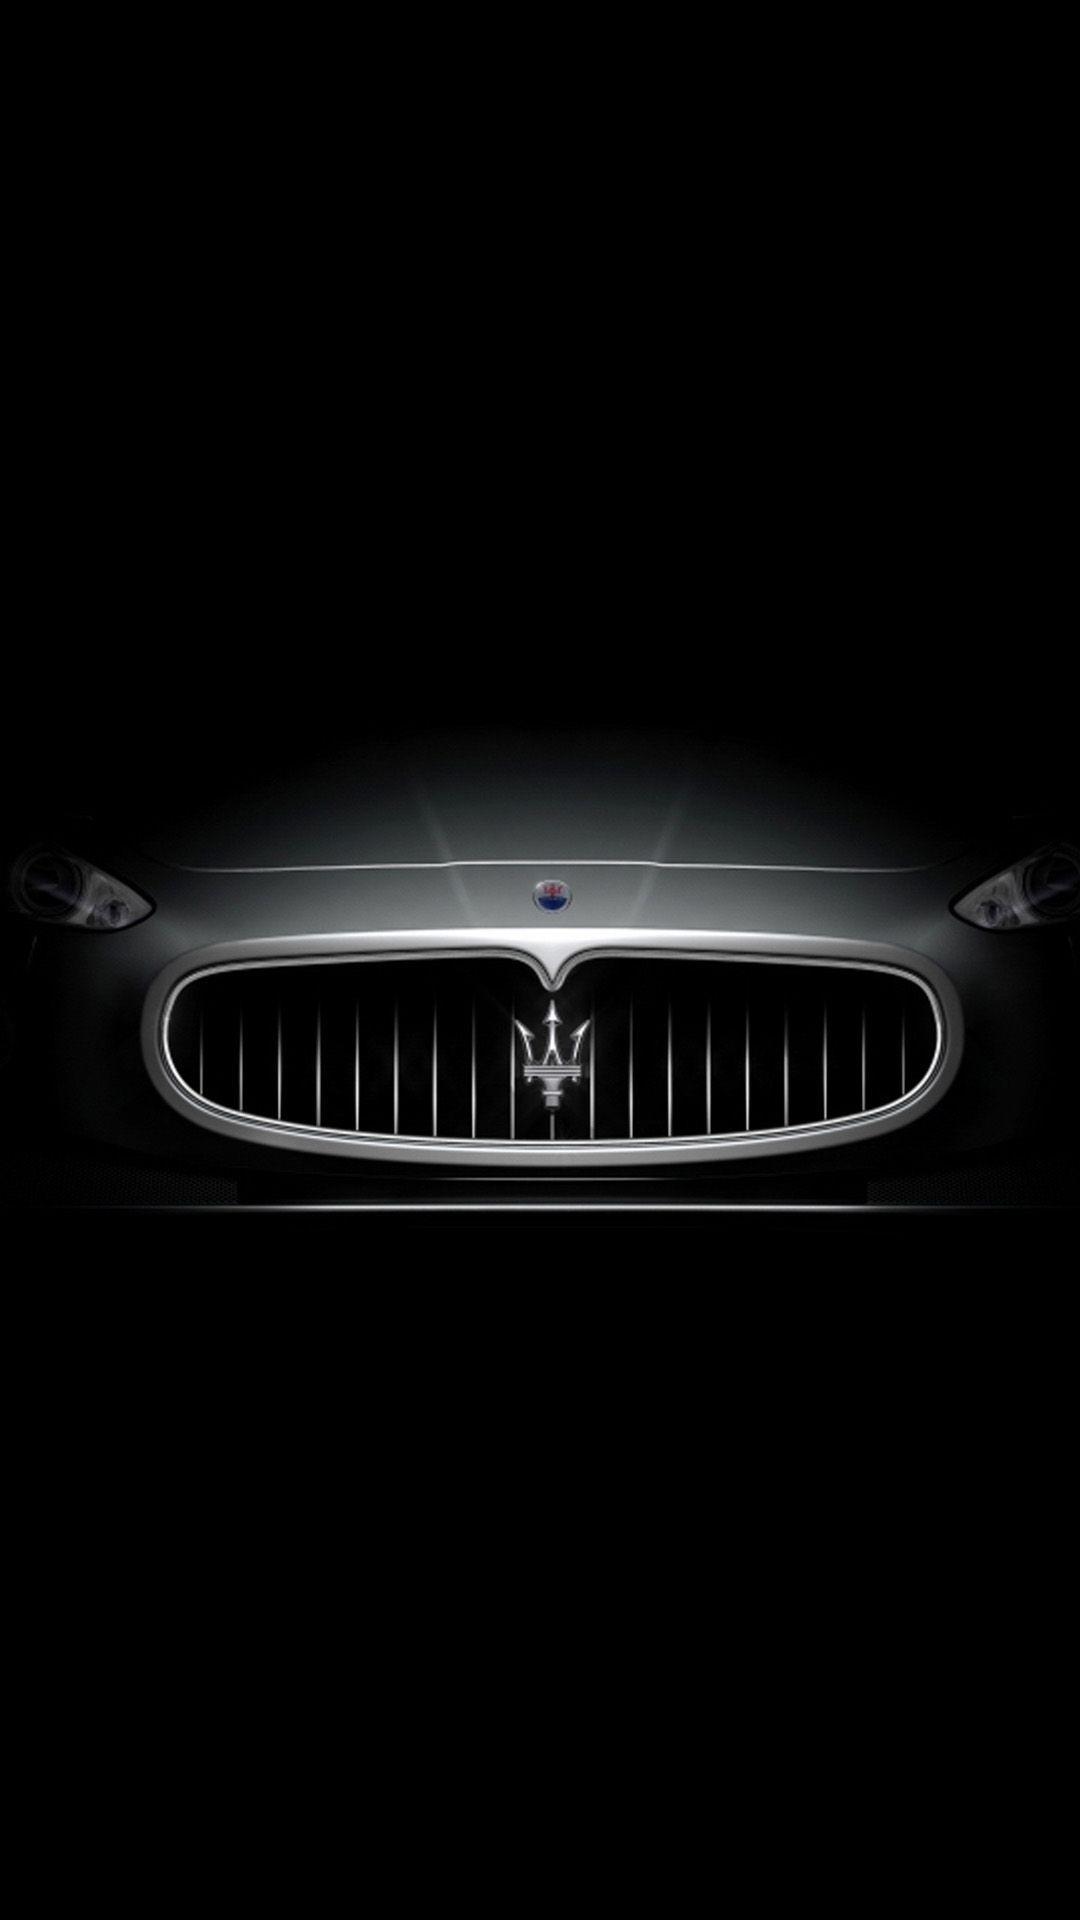 "3840x2400 Wallpaper Maserati Ghibli Nerissimo, Black Edition, 4K, 2017 ..."">"